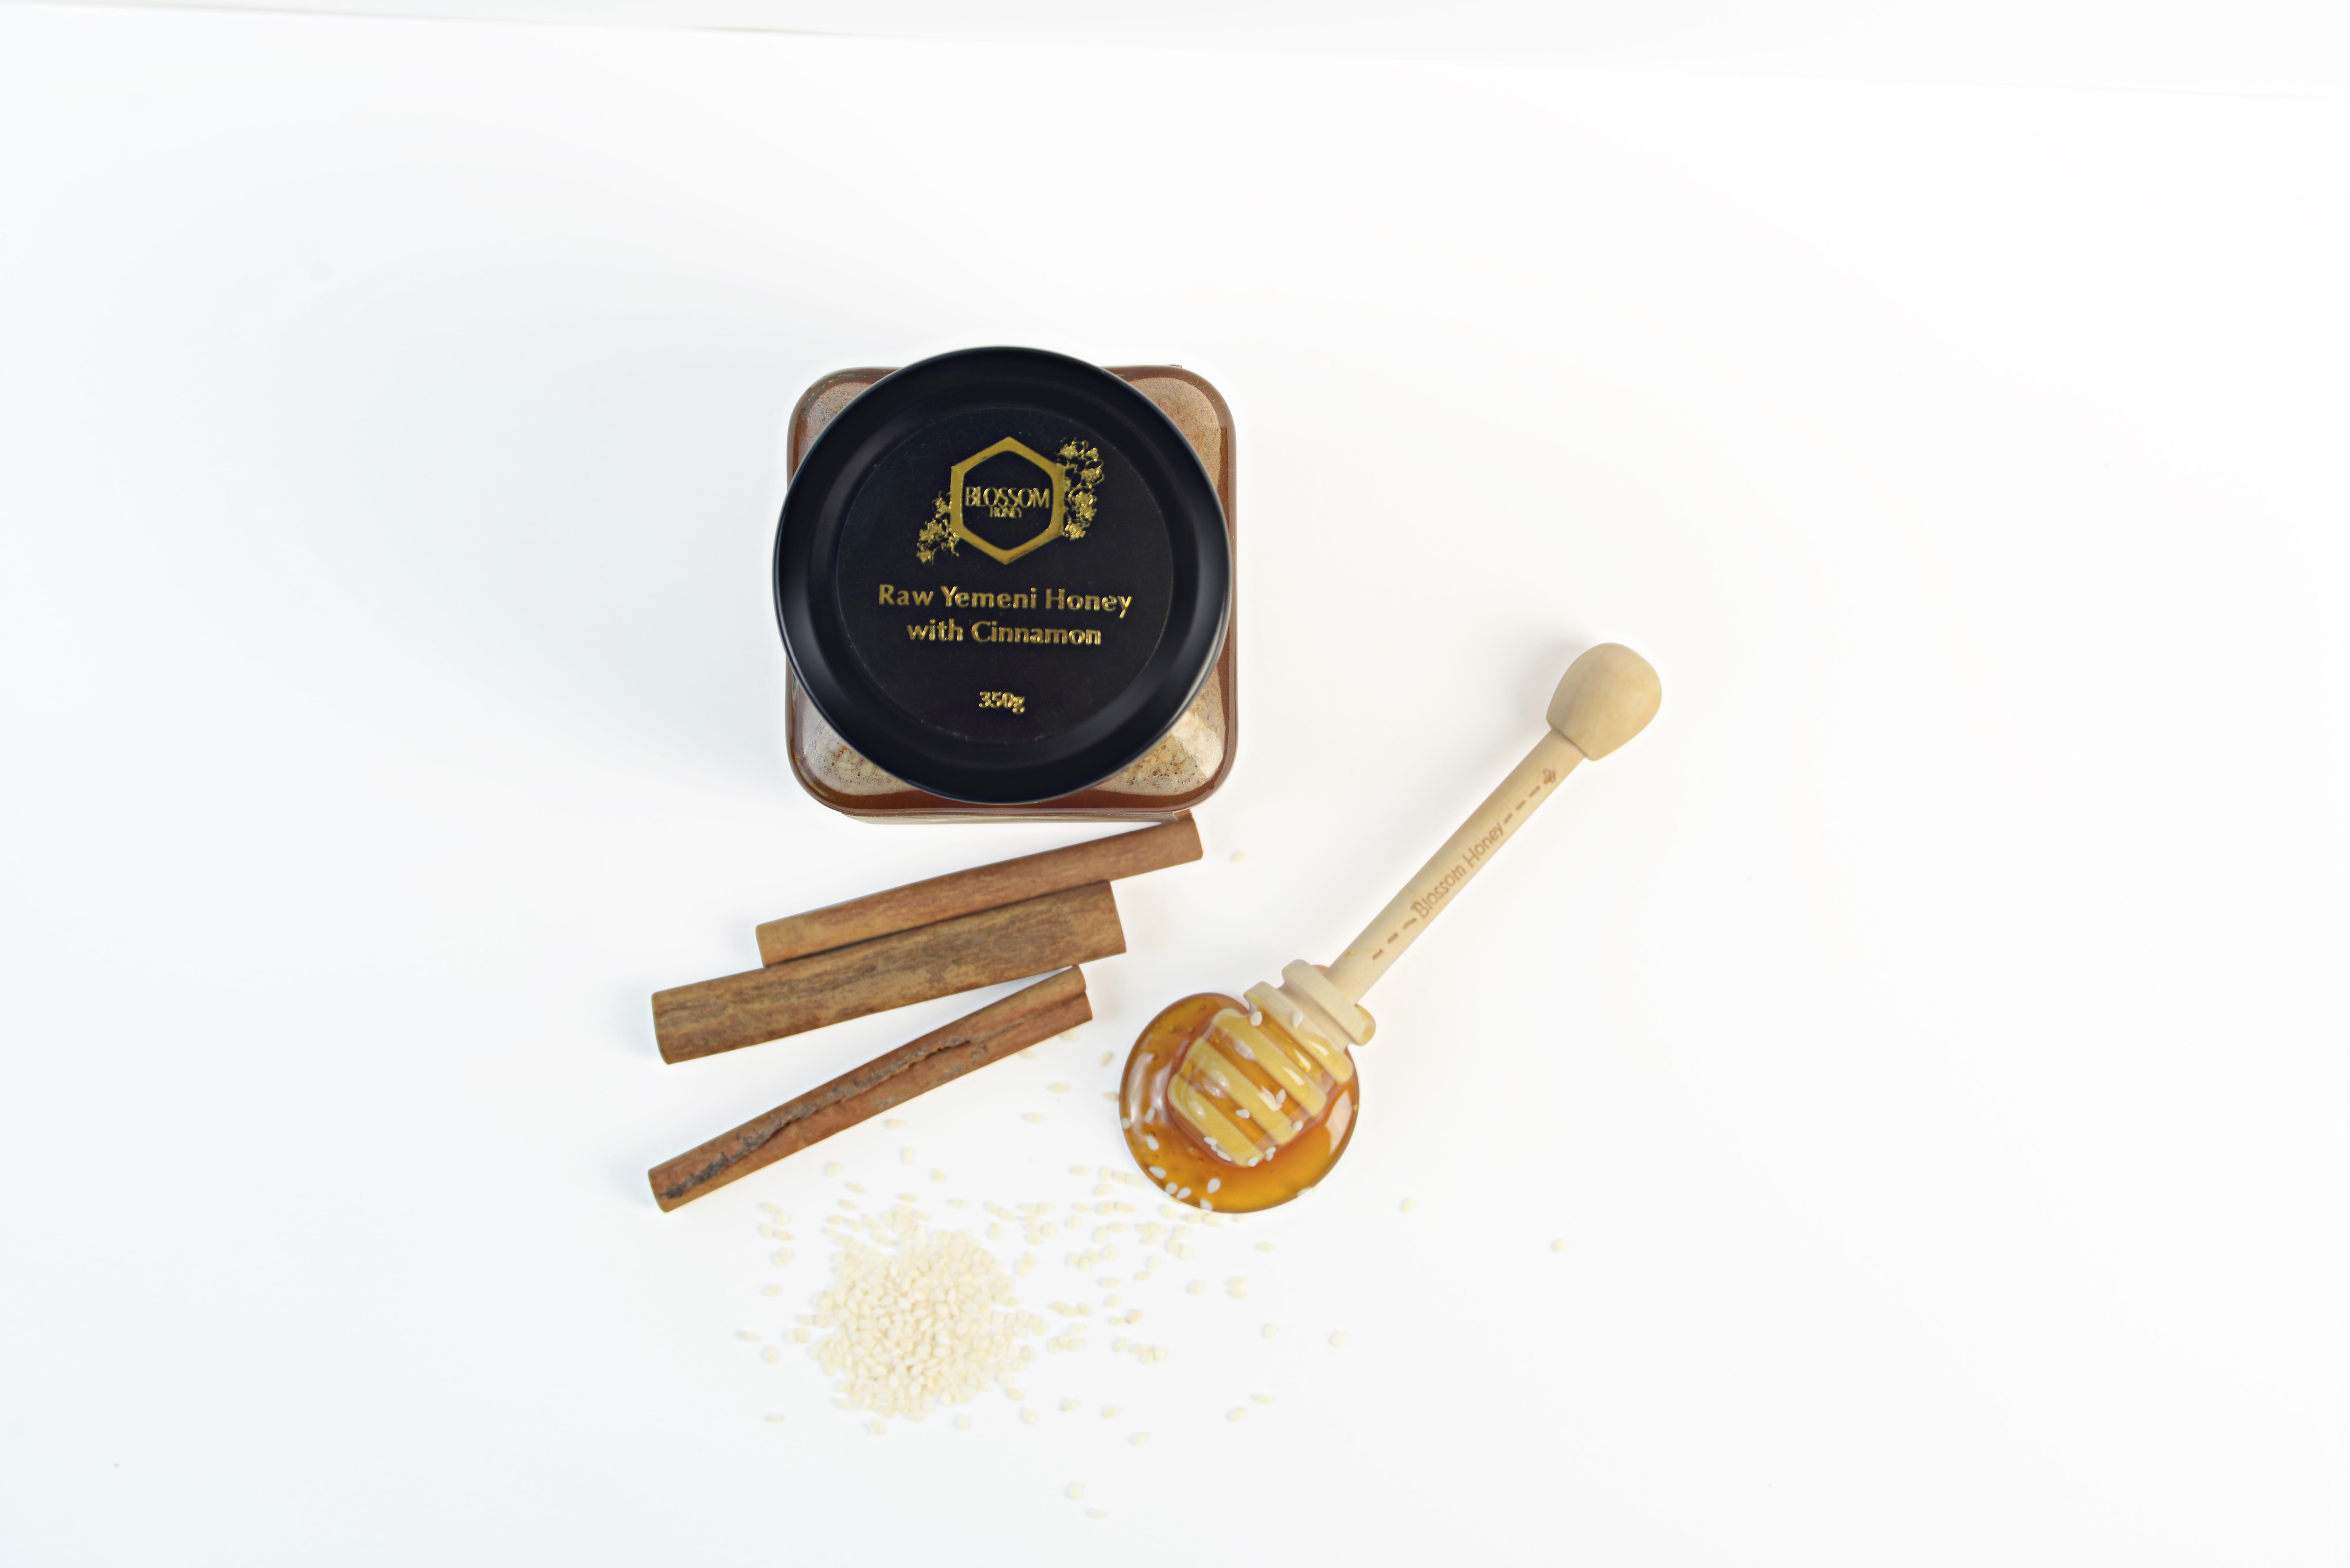 Yemeni Wildflowers honey infused with Cinnamon